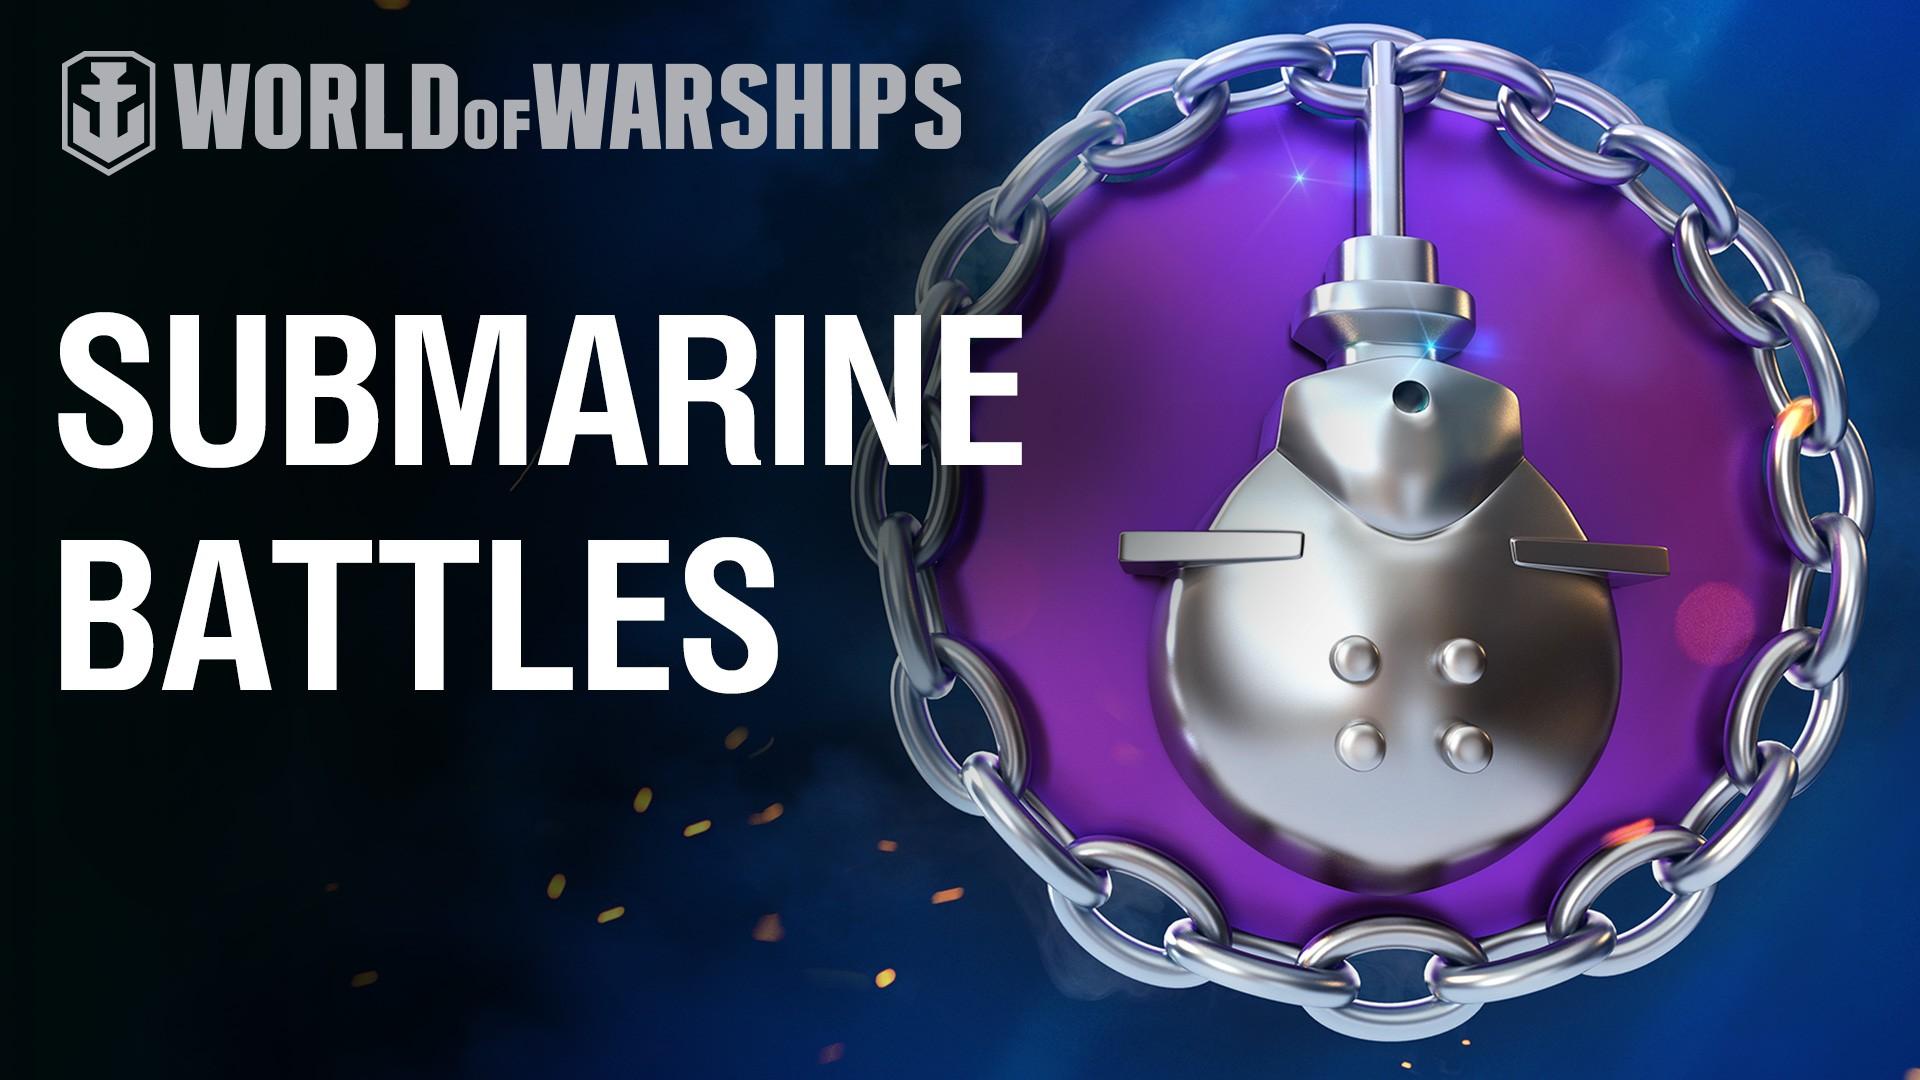 Submarines Return To World of Warships